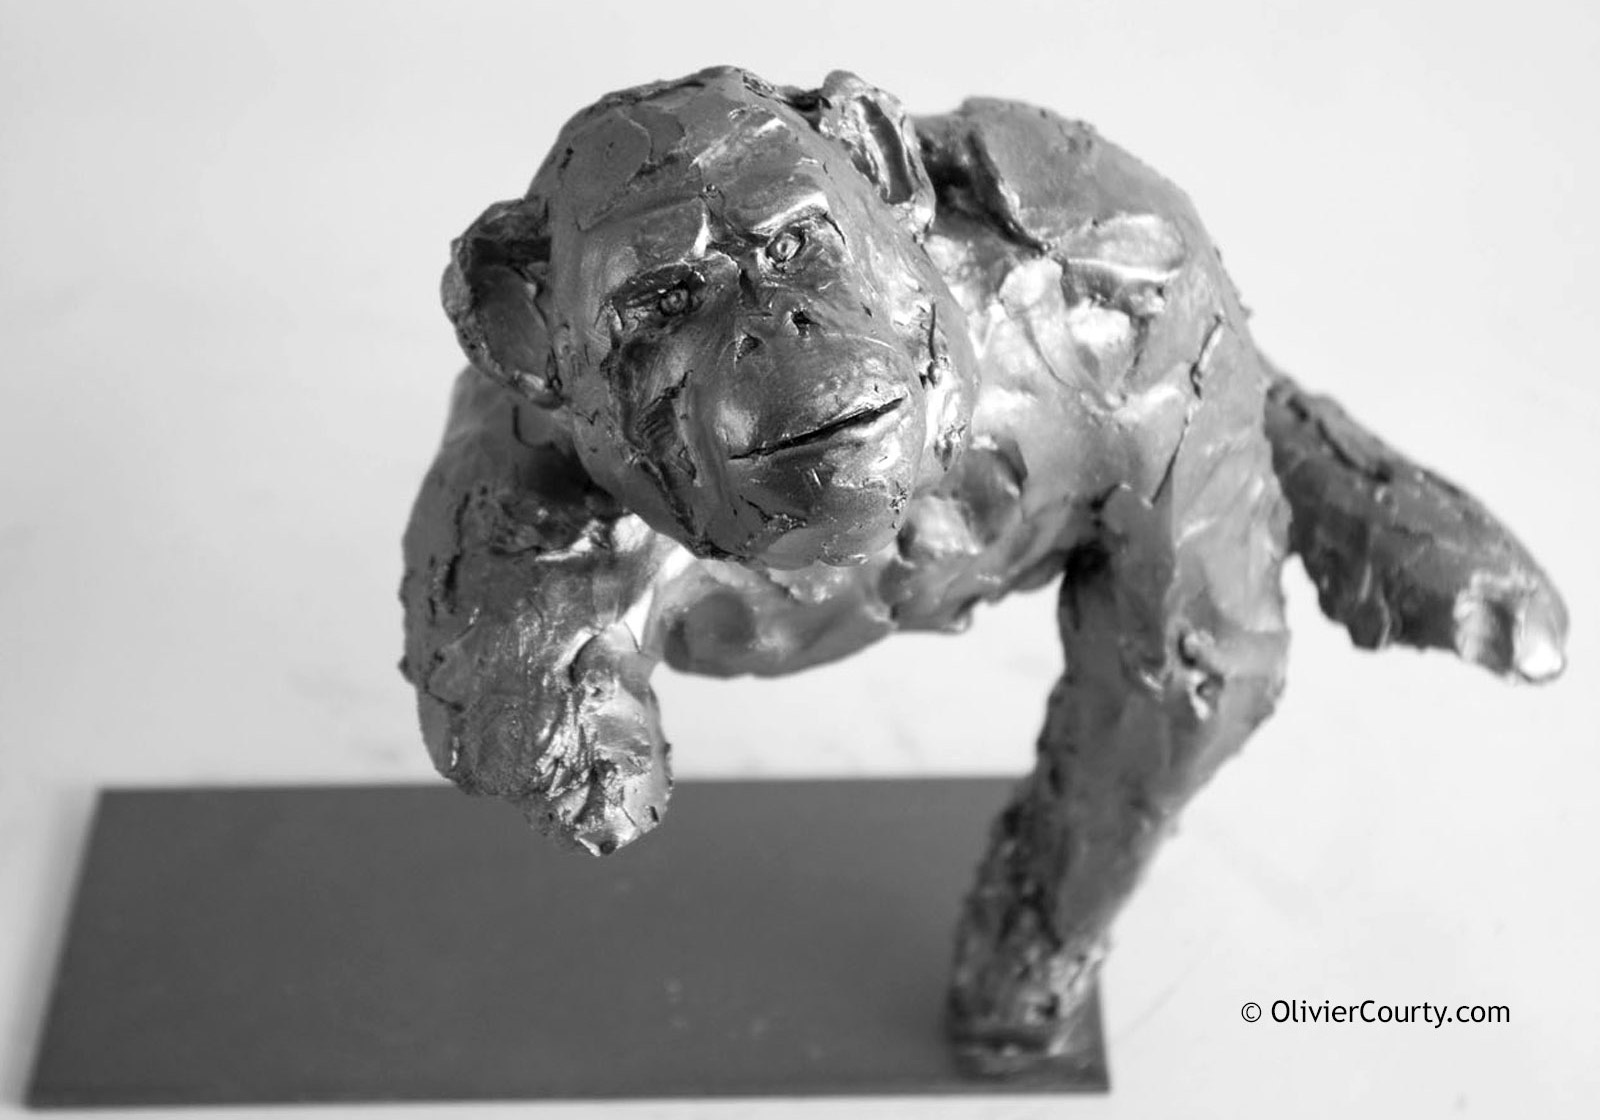 moulage-sculpture-resine-chimpanze-o-courty